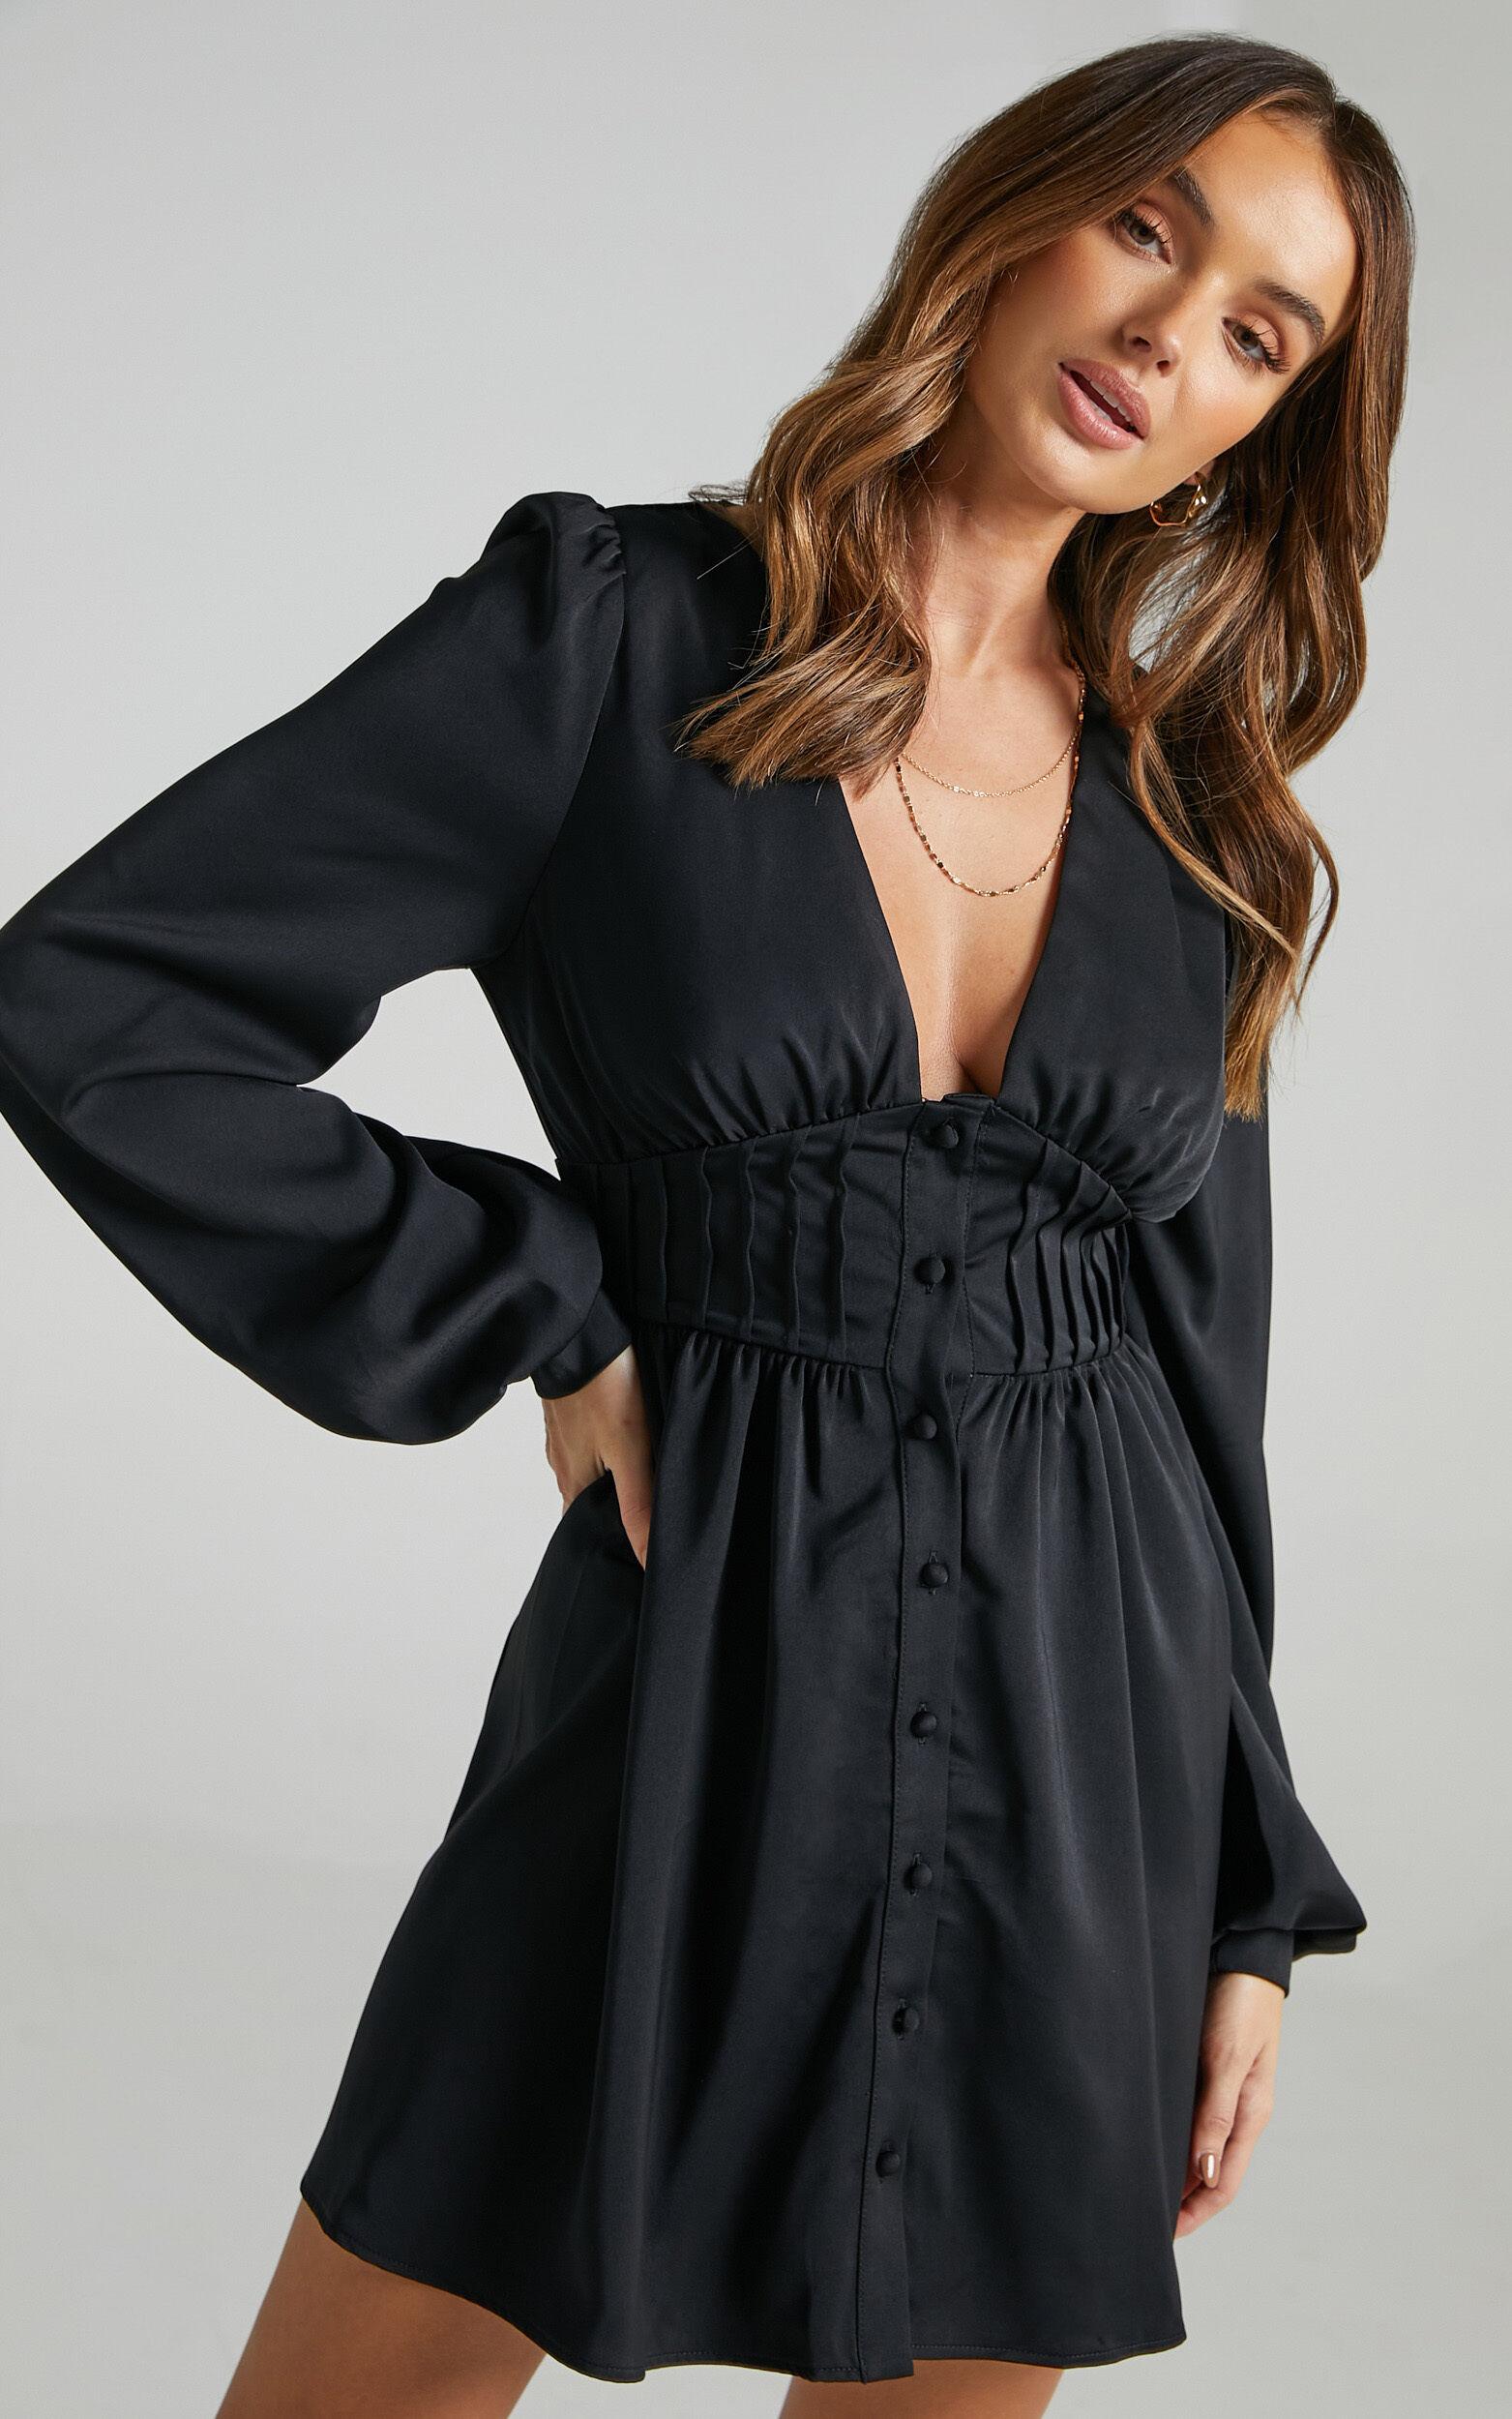 Barley Long Sleeve Corset Mini Dress in Black - 06, BLK1, super-hi-res image number null